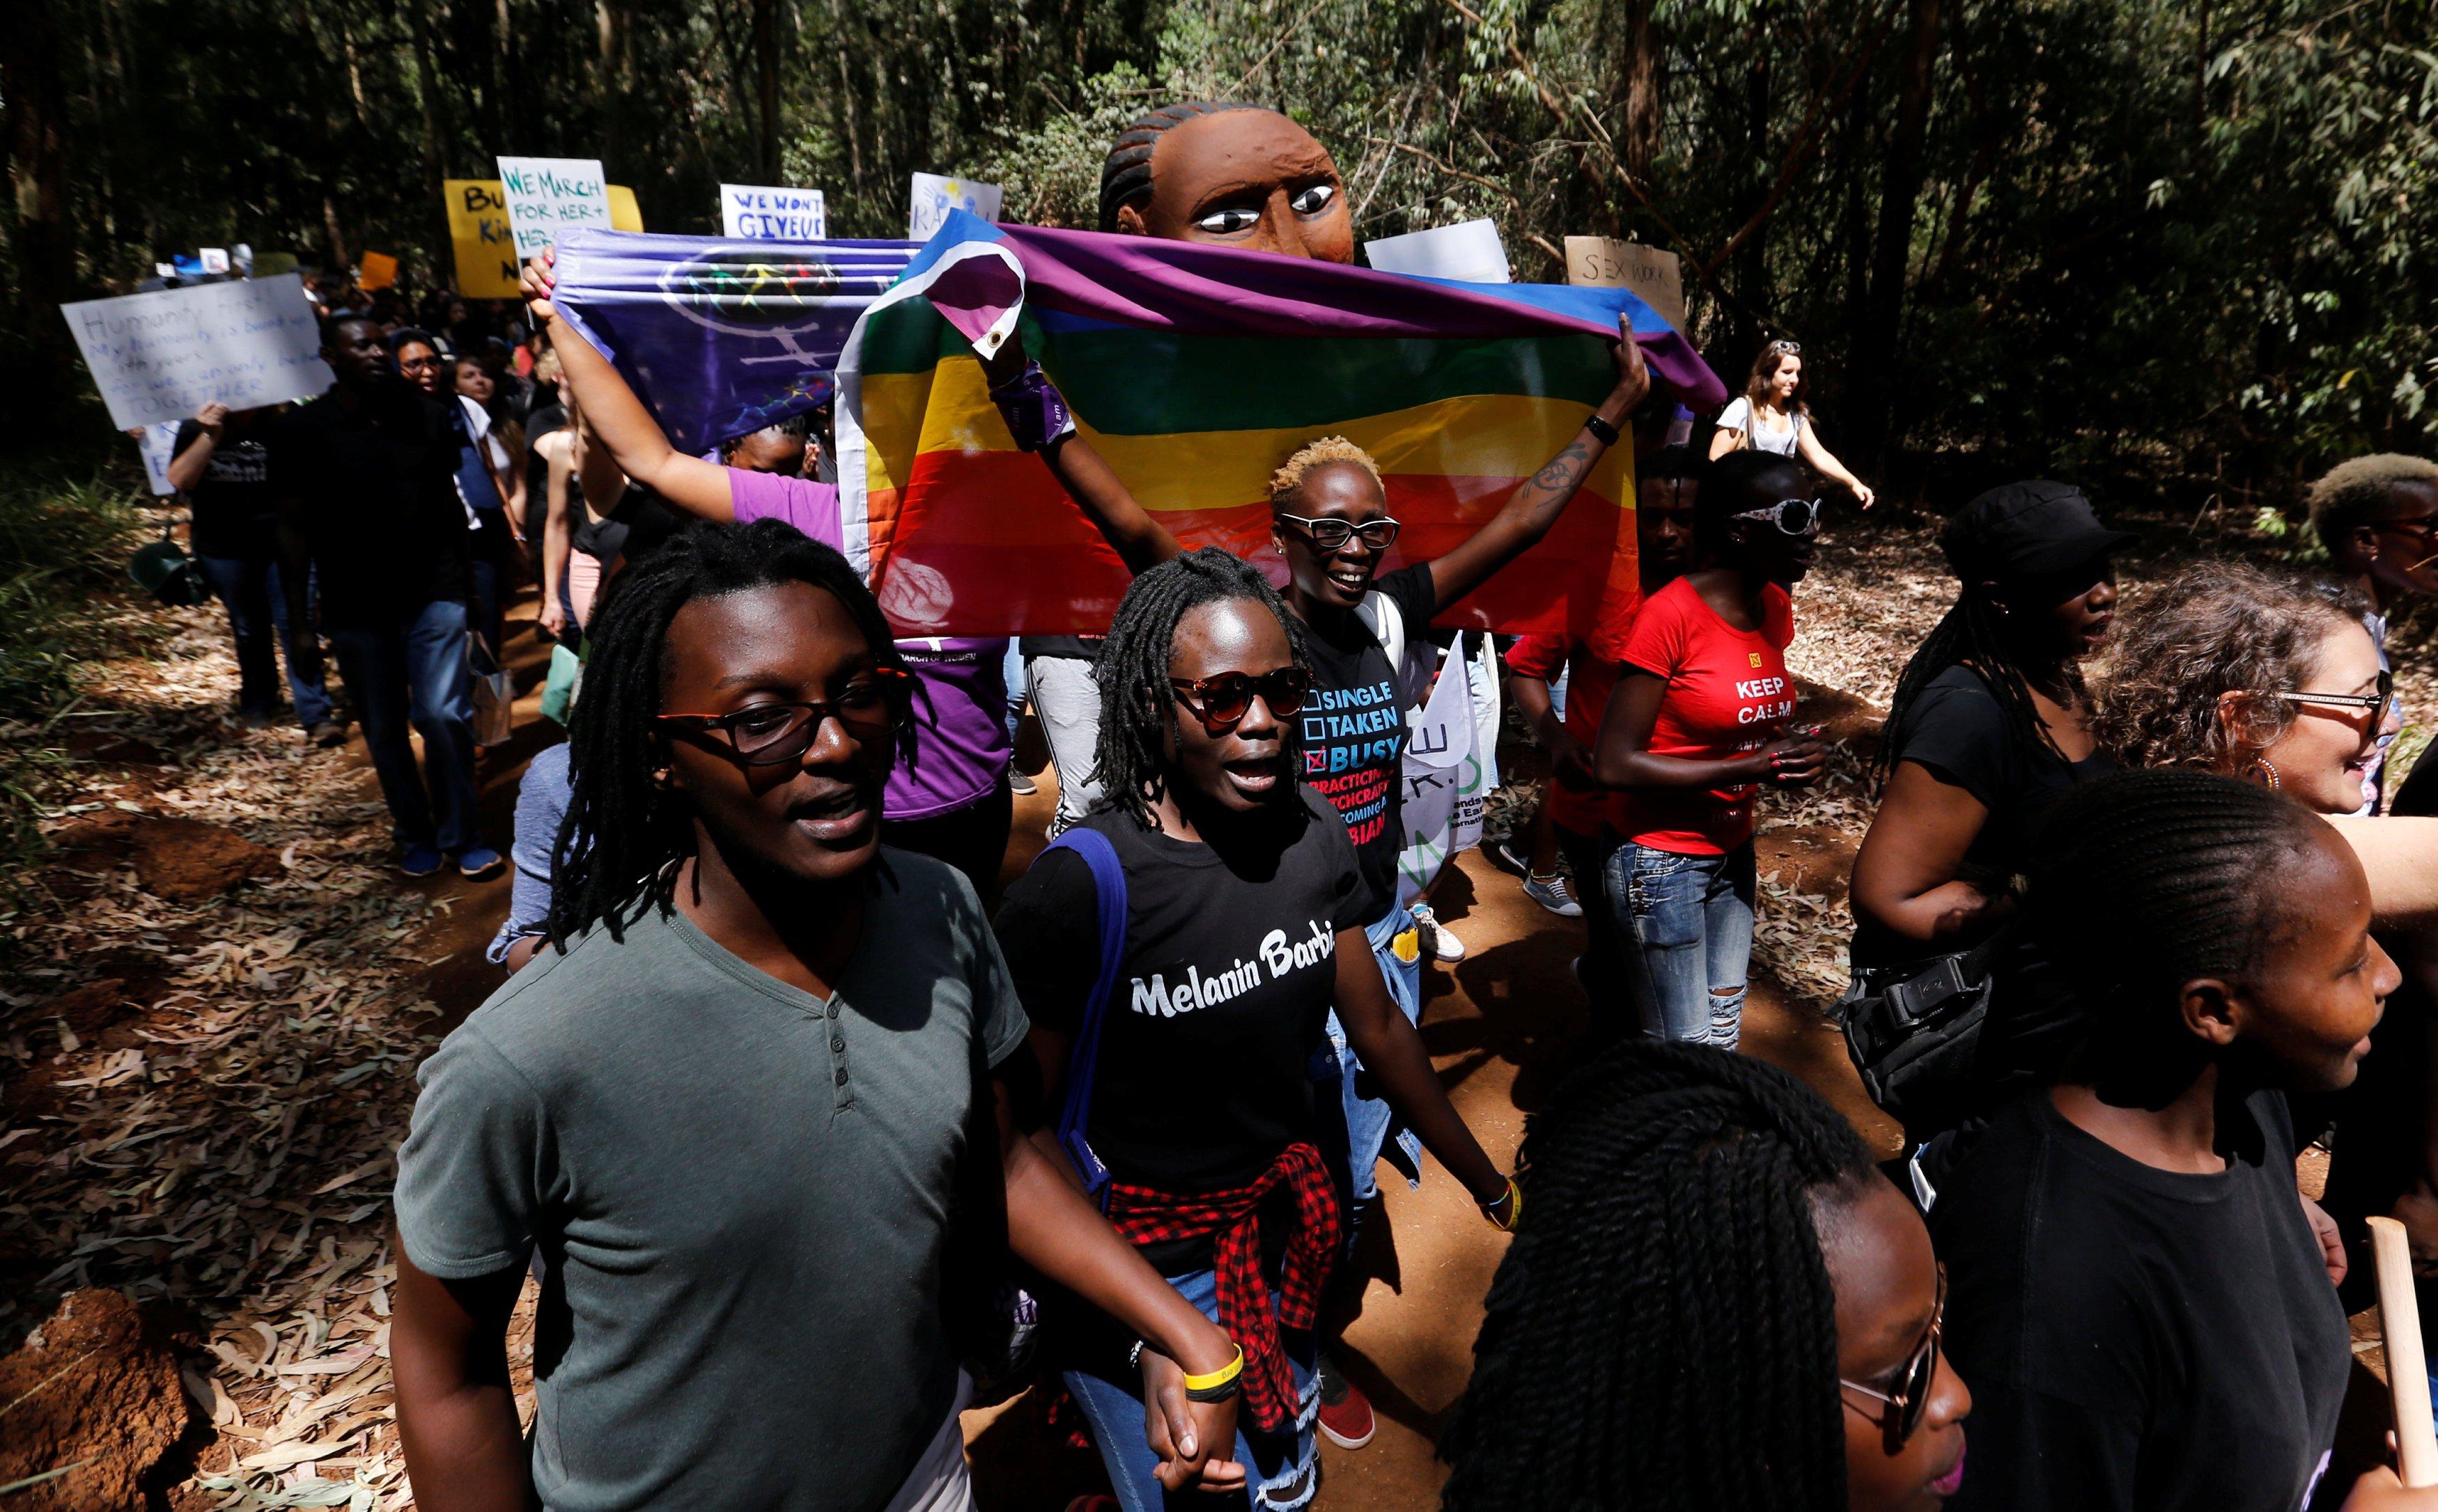 Demonstrators protest against Donald Trump during the Women's March inside Karura forest in Kenya's capital Nairobi, on Jan. 21, 2017.